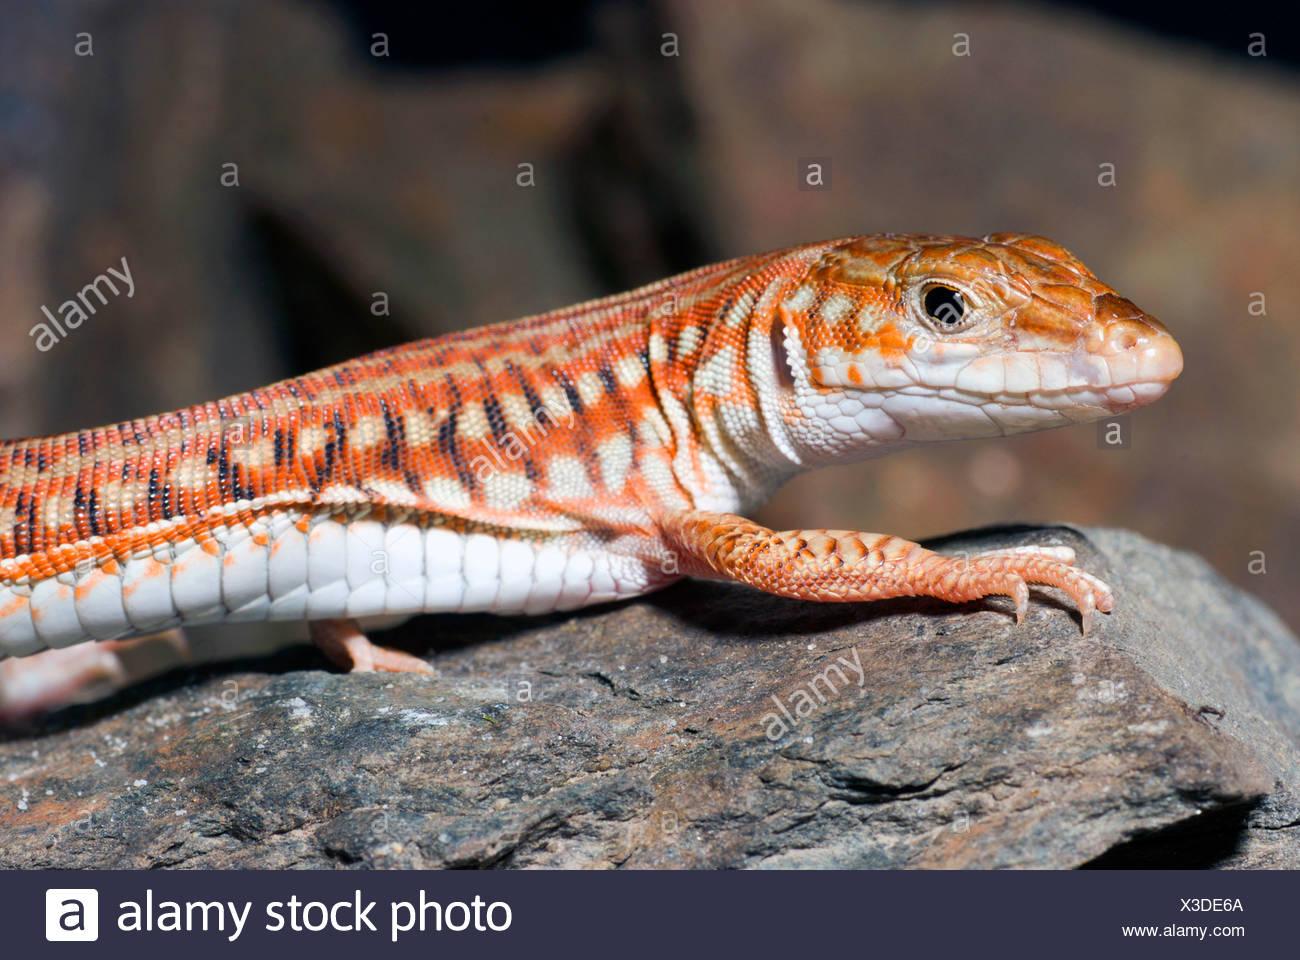 Painted Long Tailed Lizard (Latastia longicaudata), on a stone Stock Photo